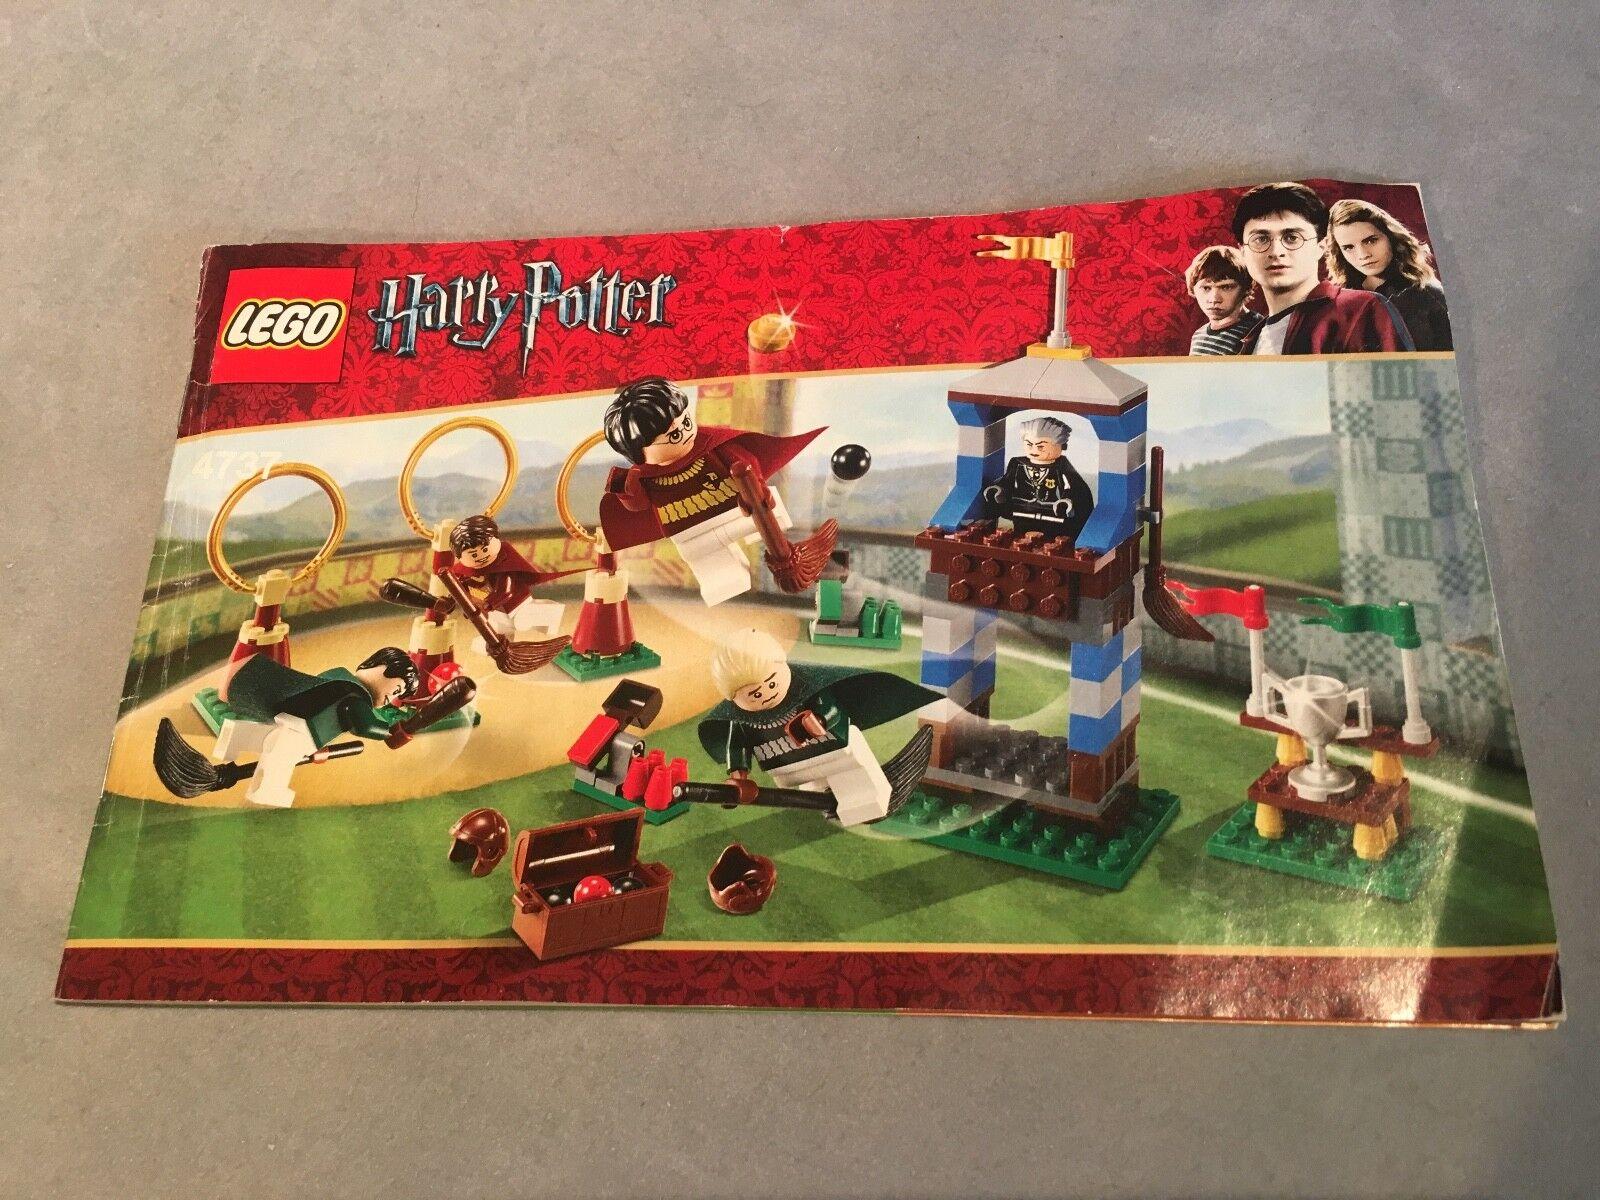 LEGO 4737 - Harry Potter Quidditch Match